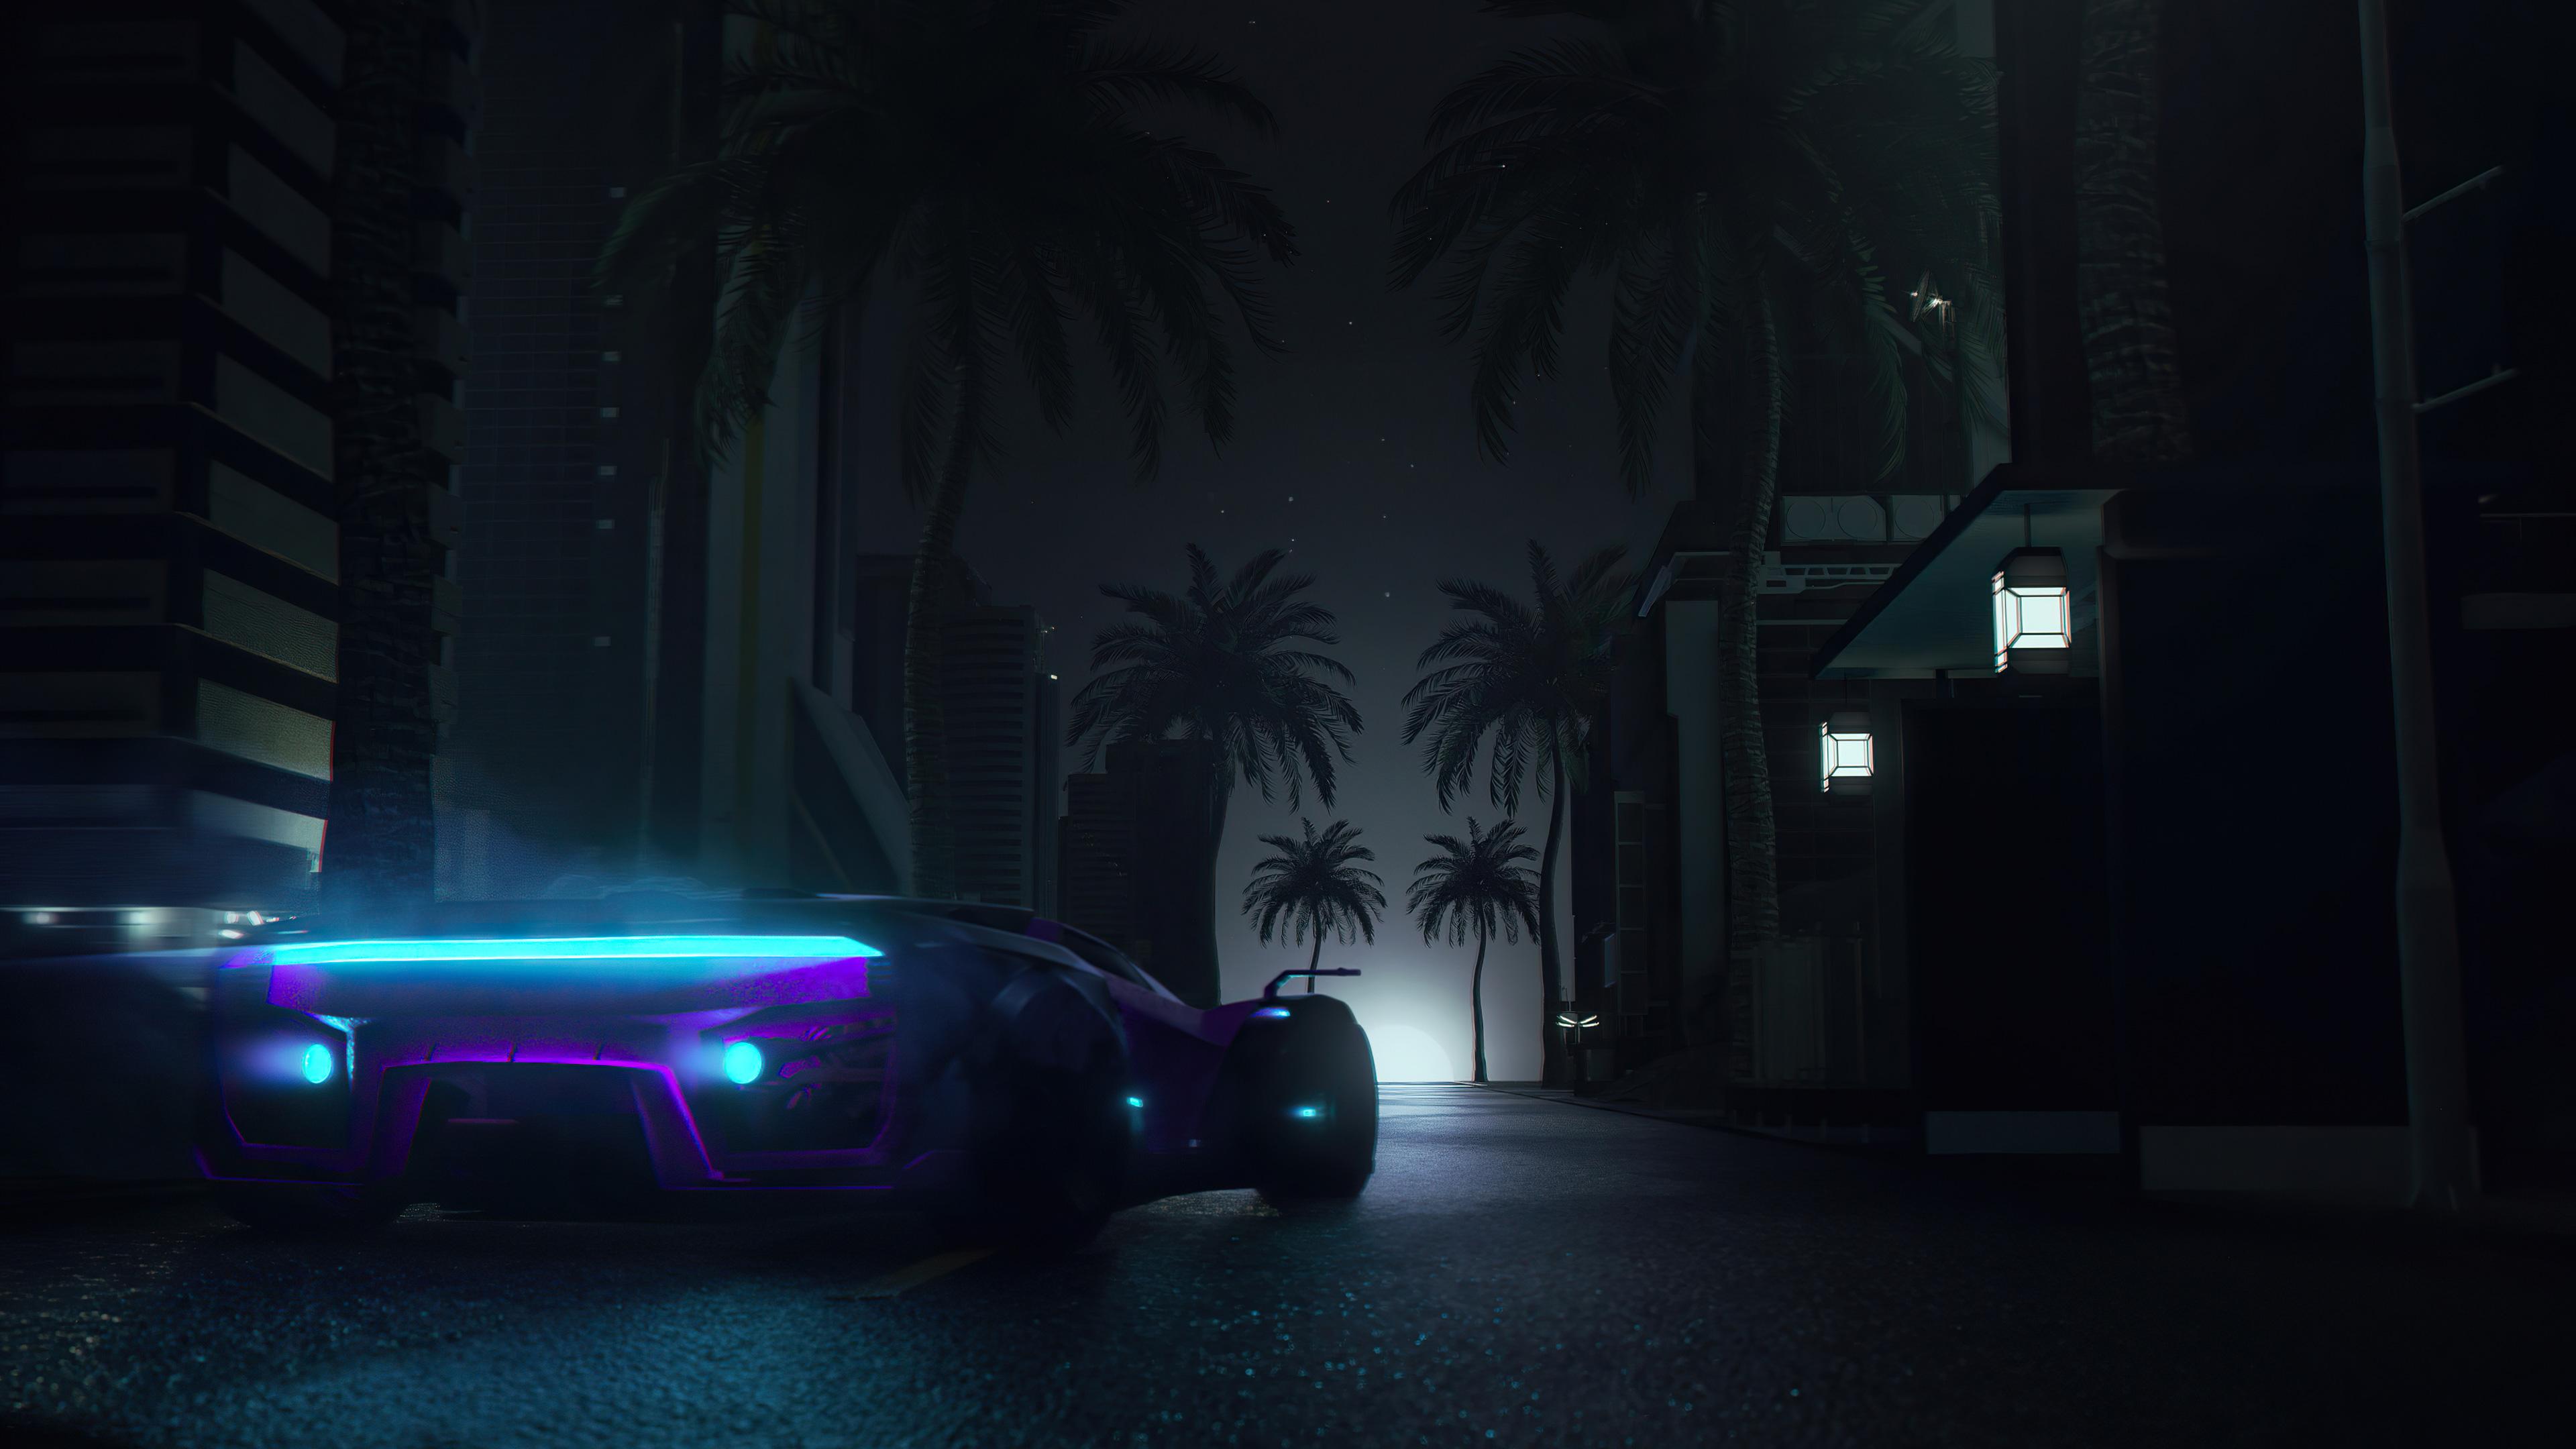 midnight neon drive 4k 1618128873 - Midnight Neon Drive 4k - Midnight Neon Drive 4k wallpapers